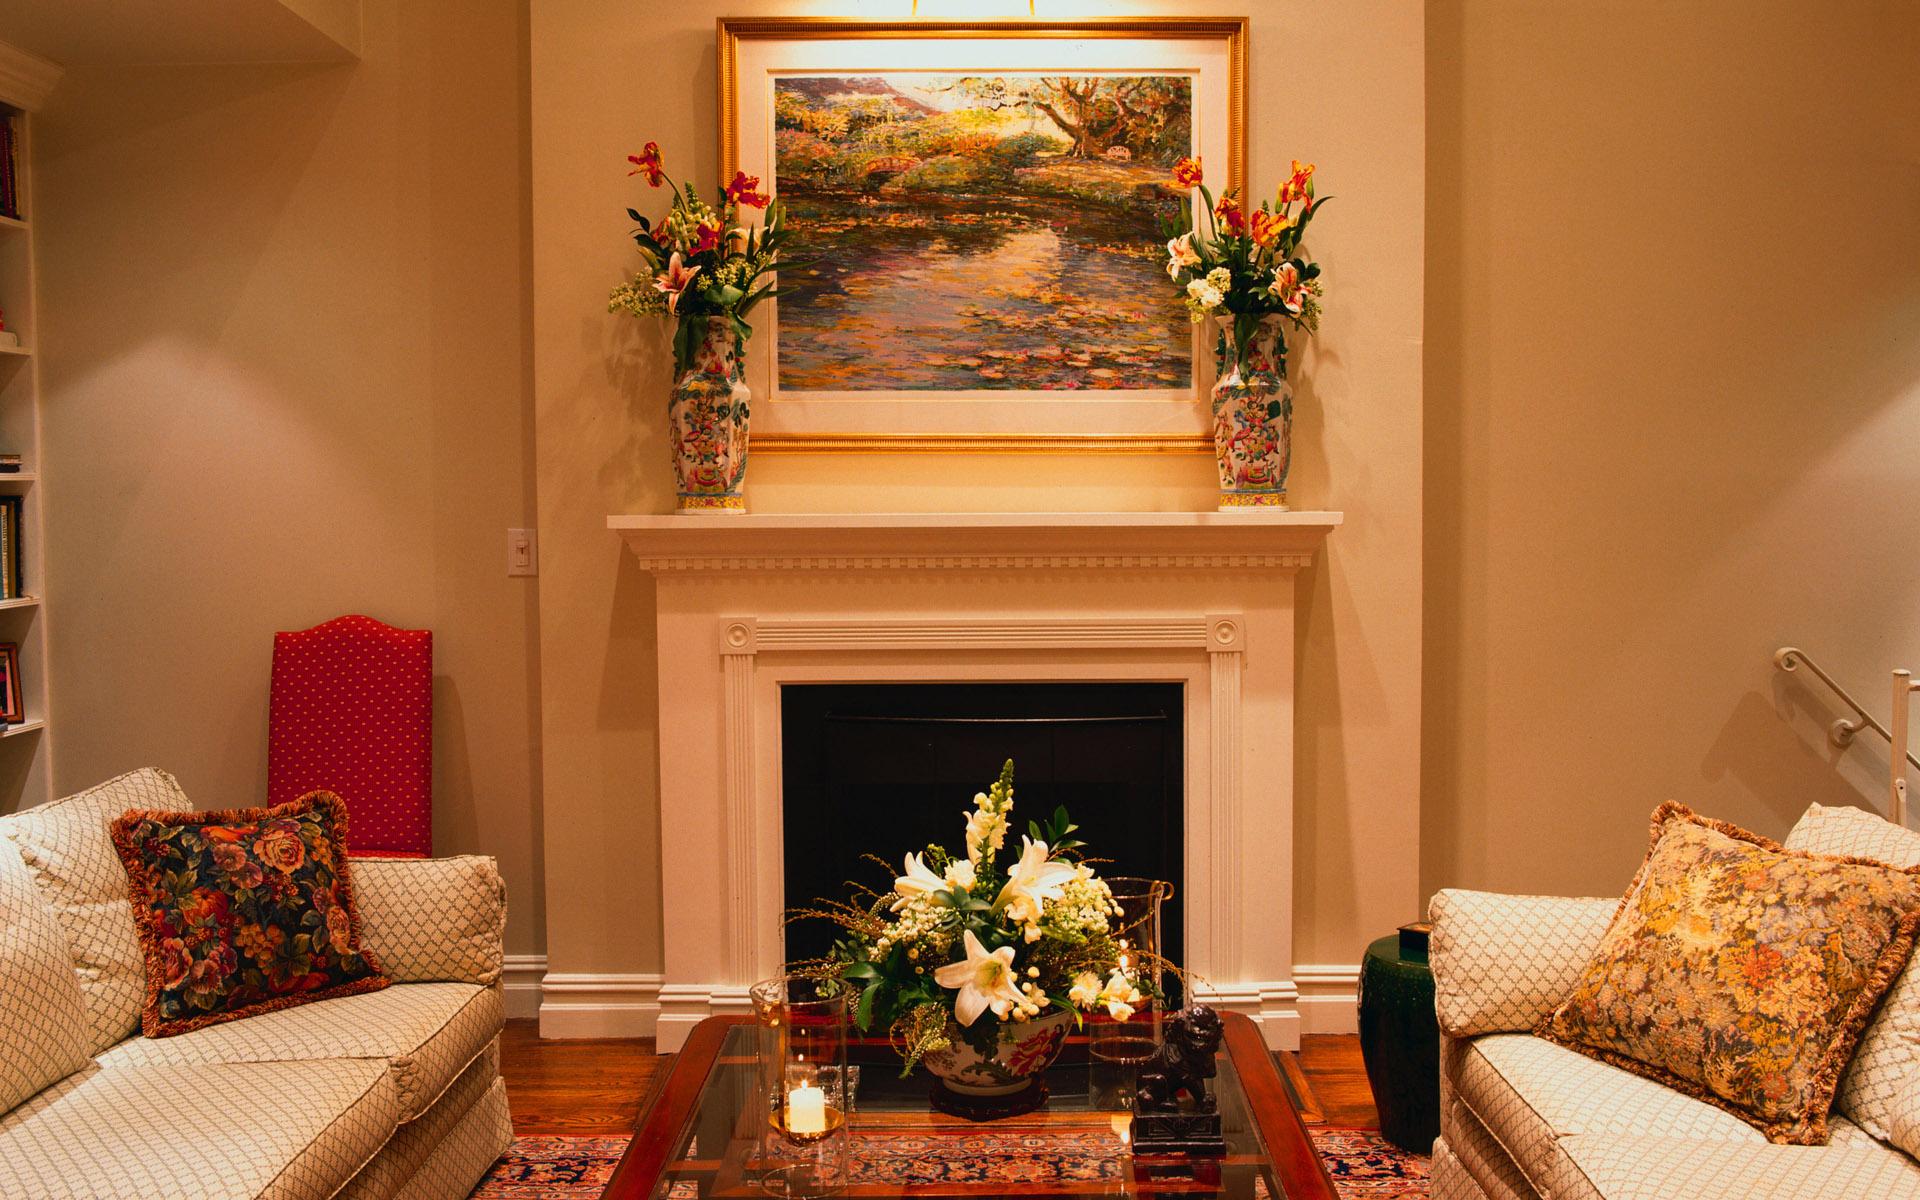 modern-living-room-decor-ideas modern living room decor ideas